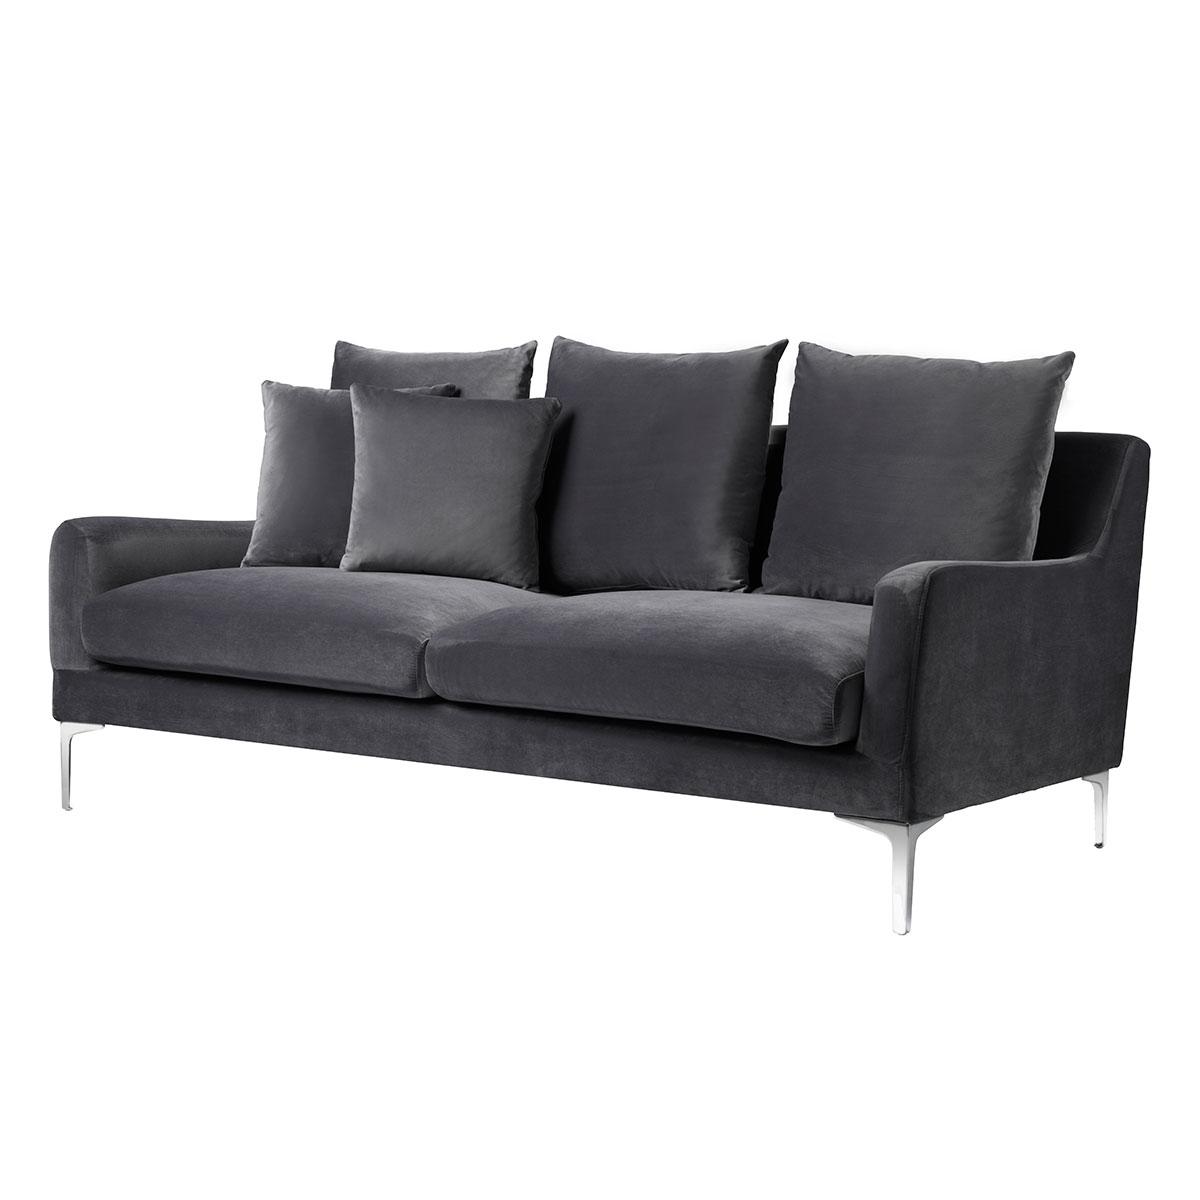 Image of   Living&more 3 pers. sofa - Viktoria - Grå